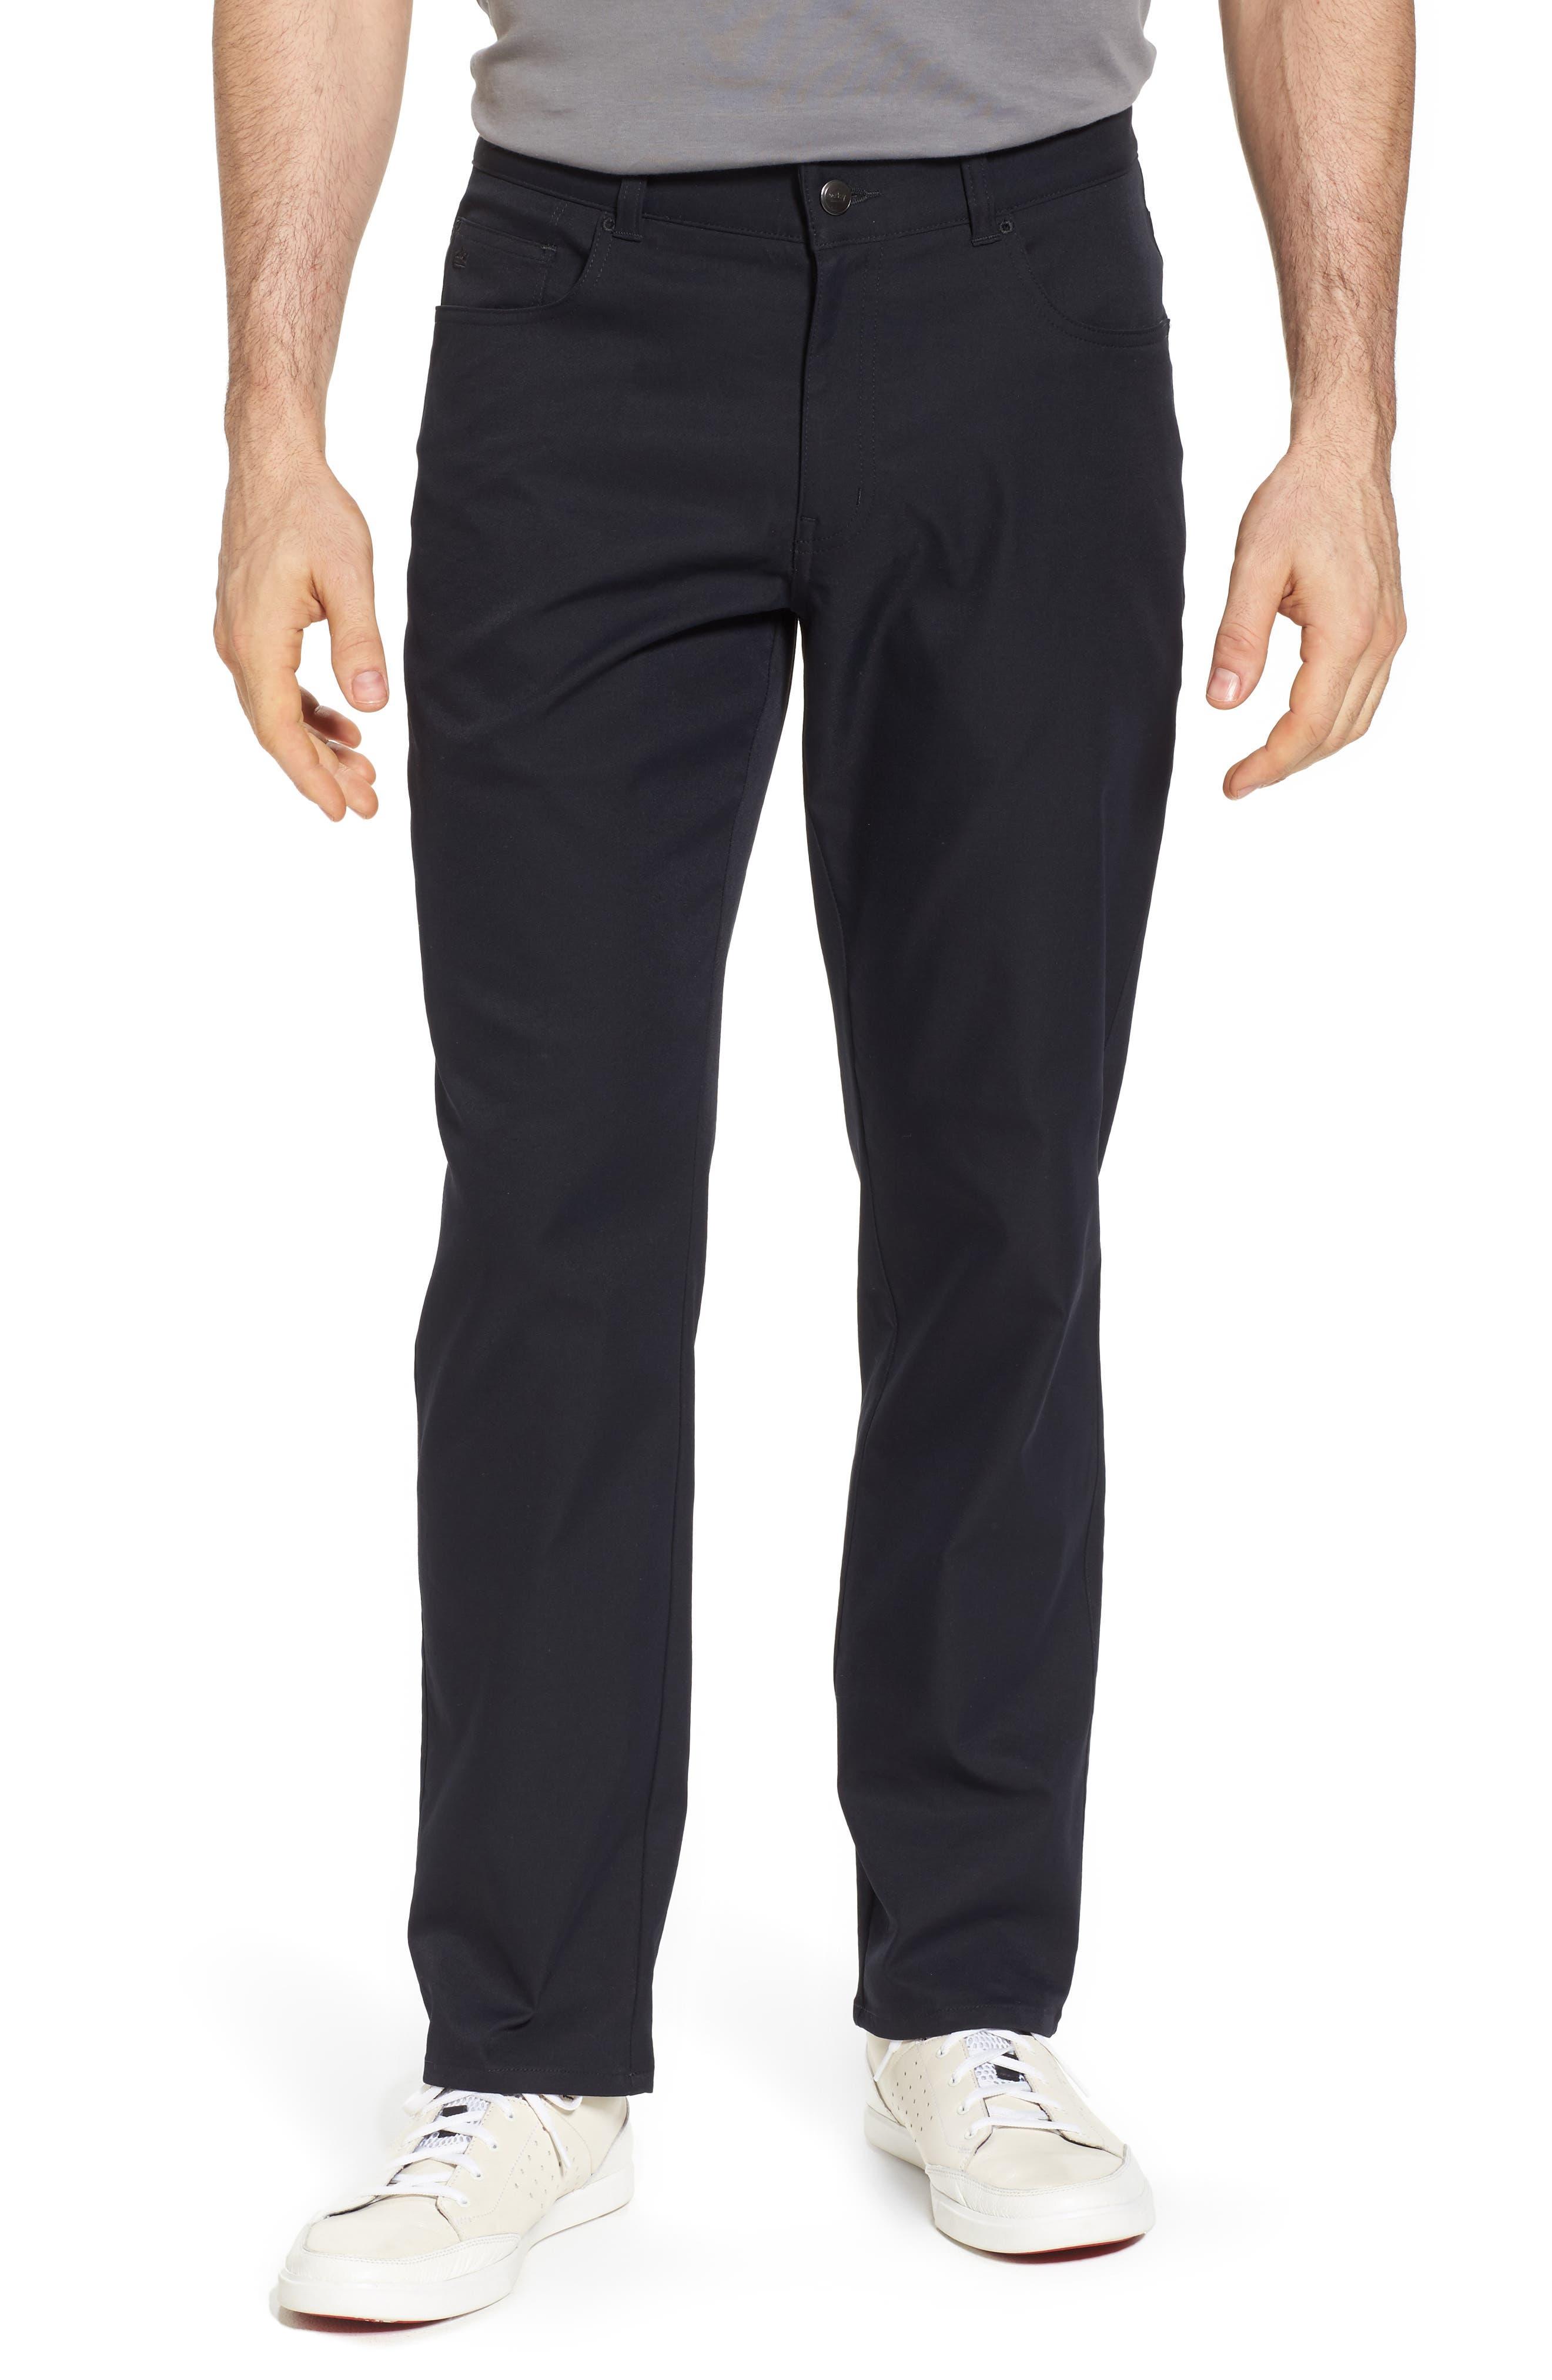 EB66 Performance Six-Pocket Pants,                         Main,                         color, Black